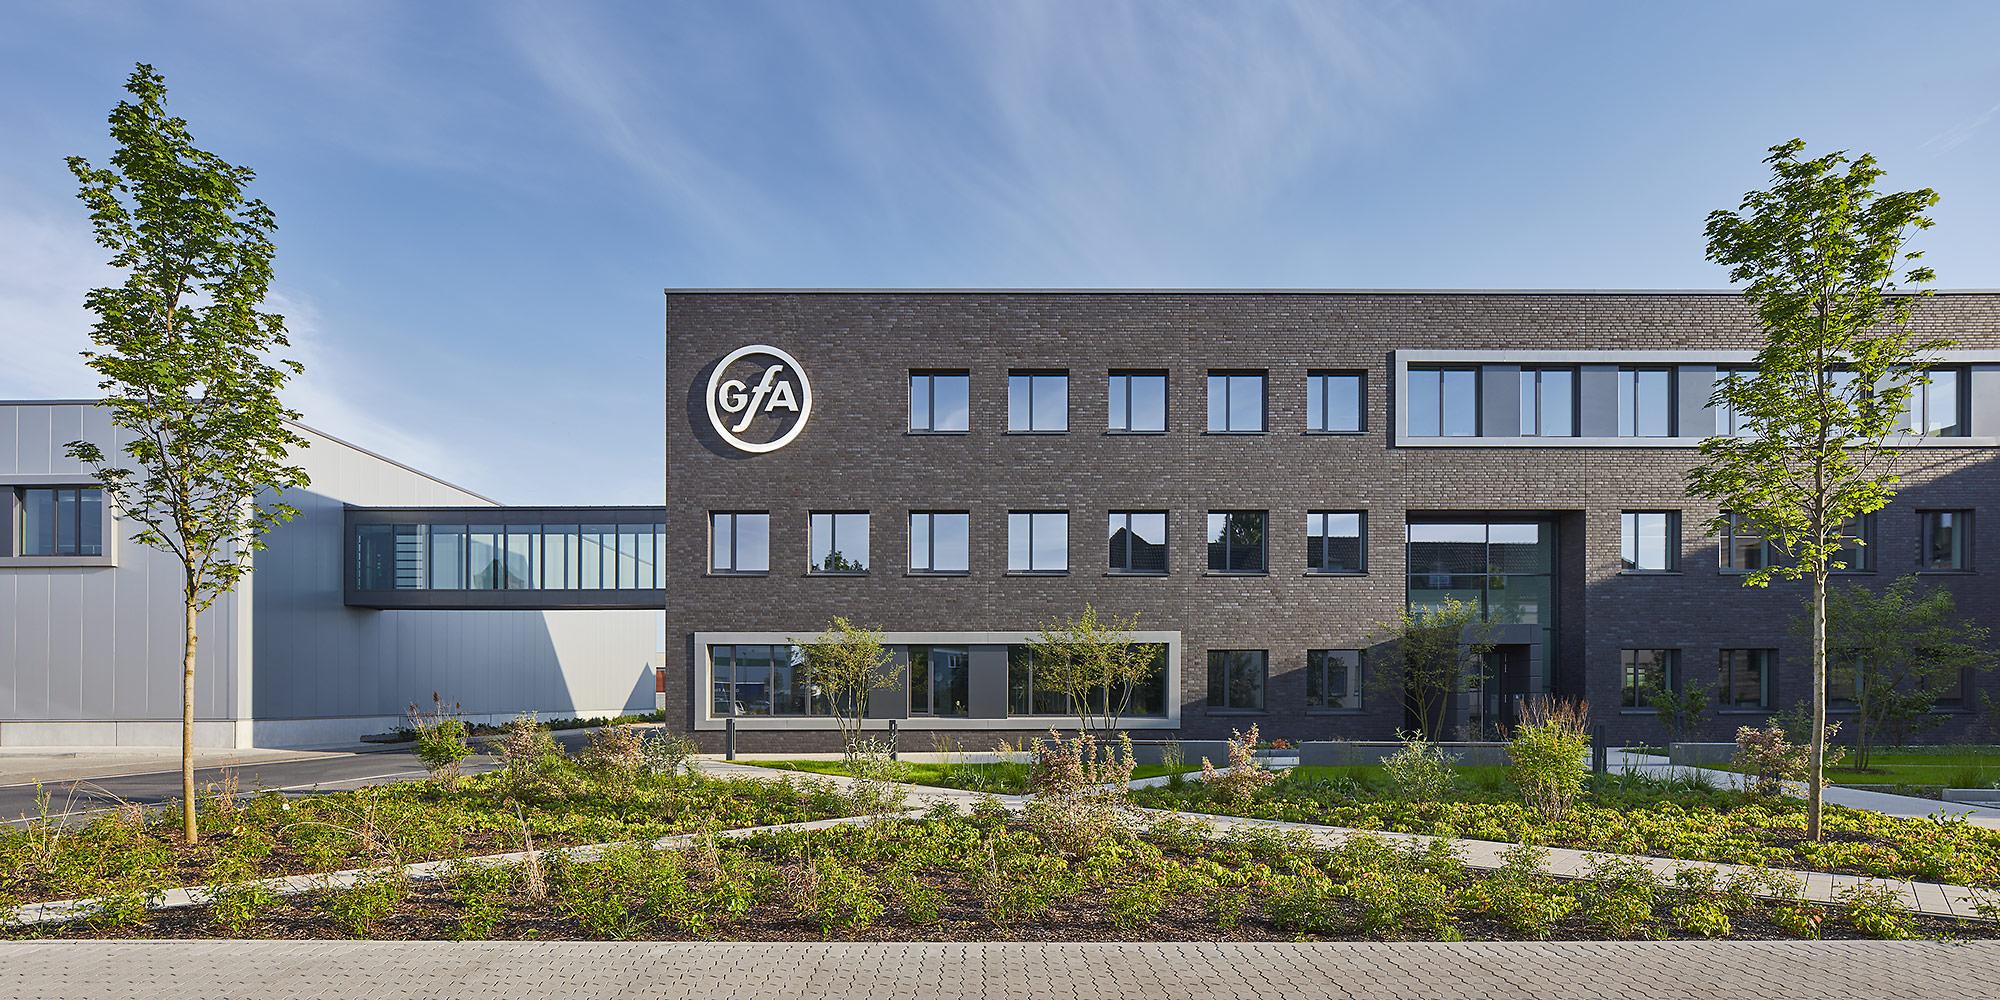 Architekturfotograf Düsseldorf, GfA Elektromaten, Düsseldorf